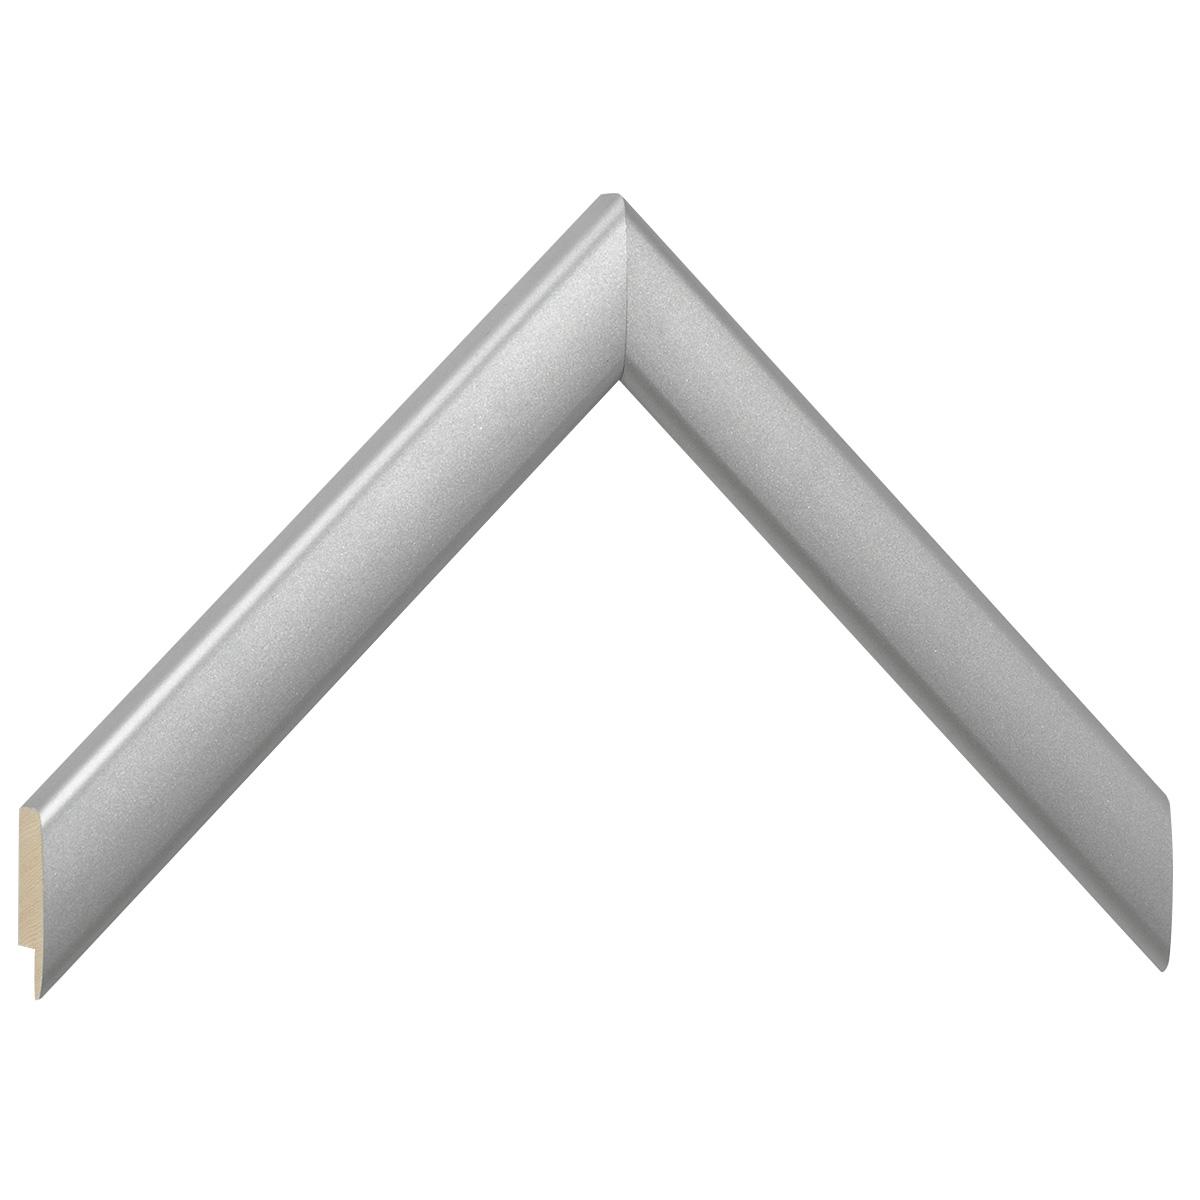 Moulding ayous, width 23mm height 13 - matt silver